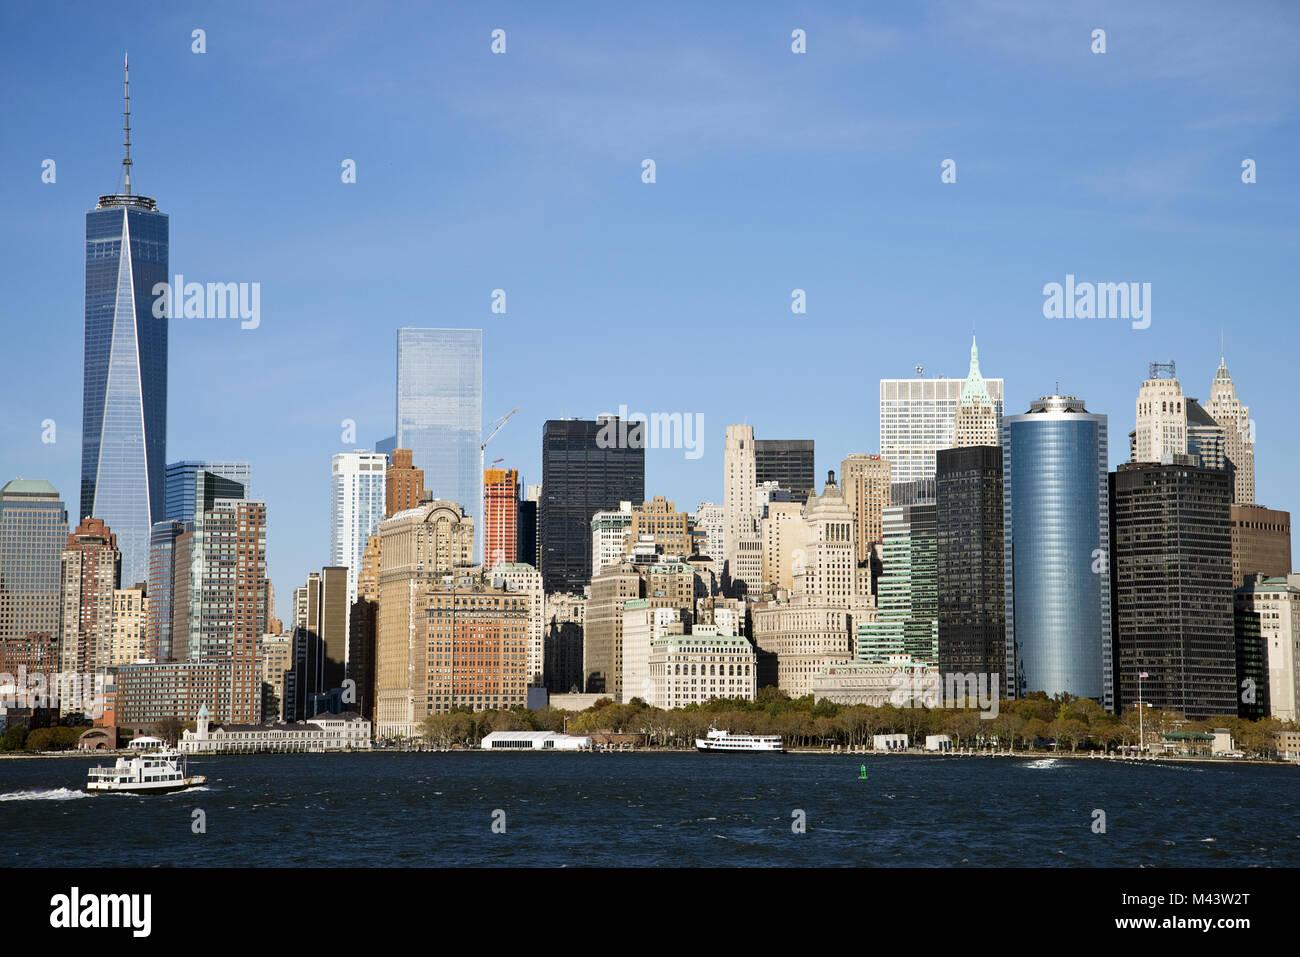 BEACON NEW YORK-PANORAMIC VIEW- NY-B*